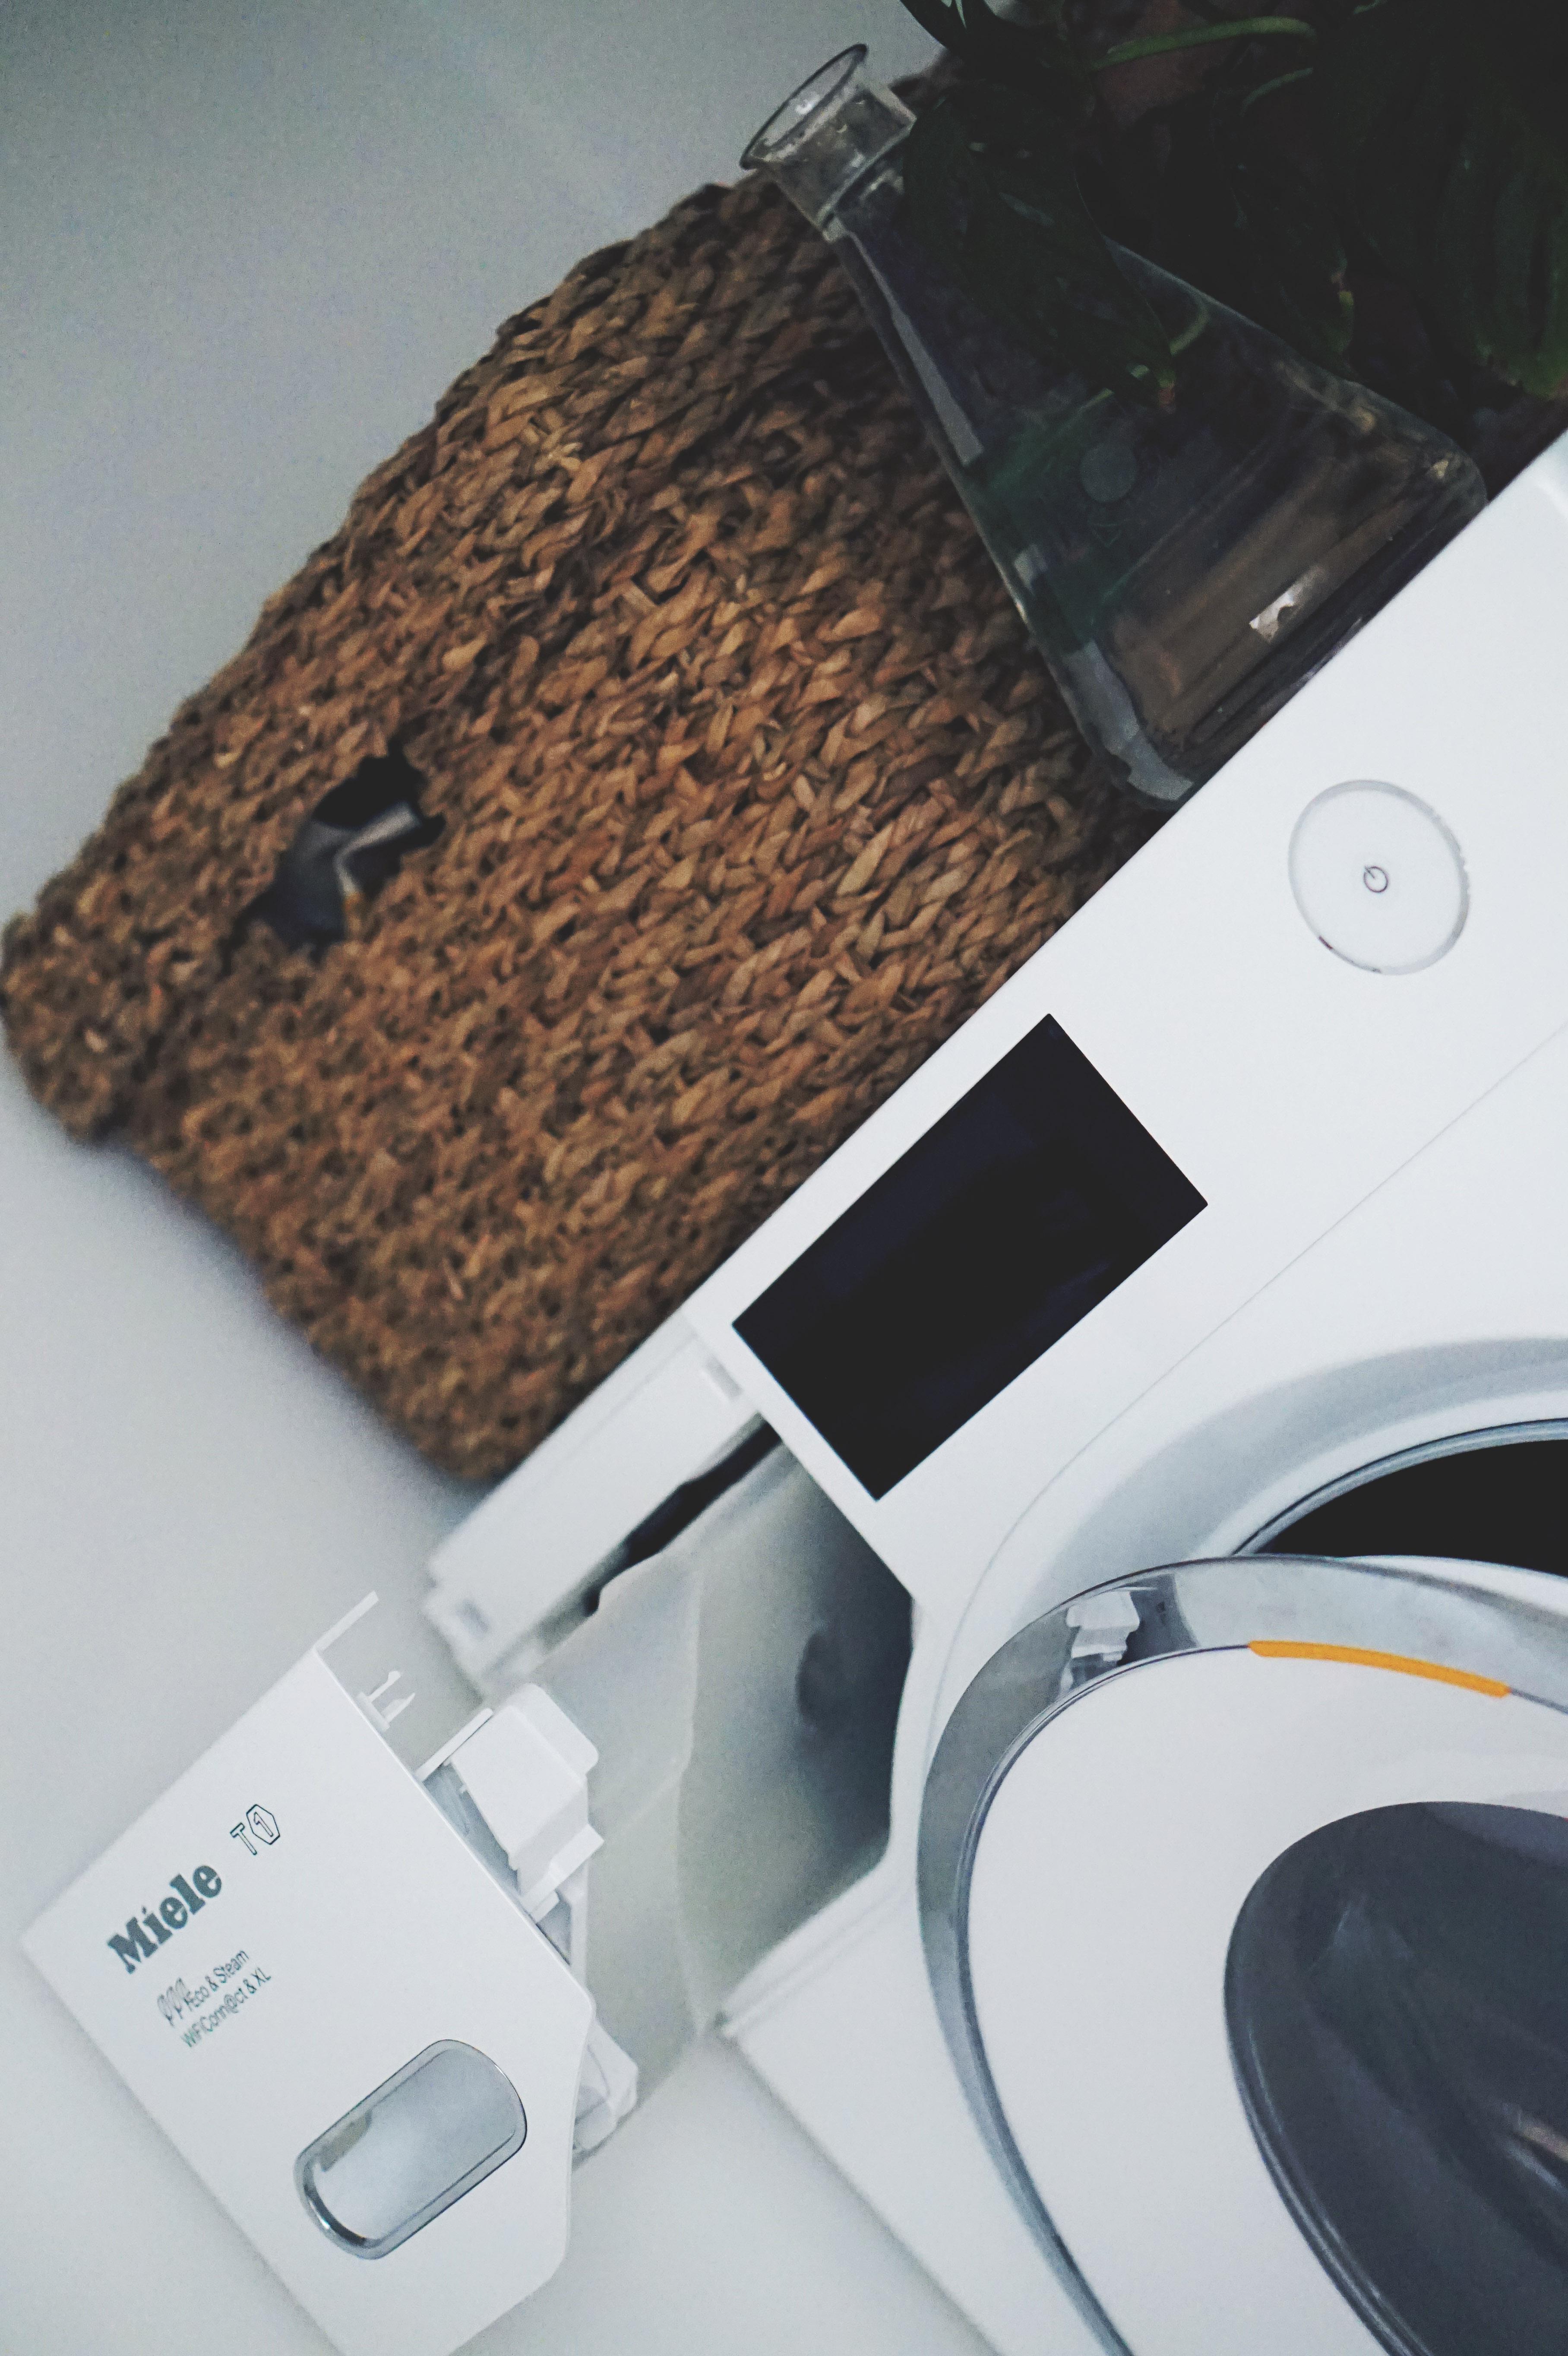 Huskøb: Livet med bryggers og <strong>Mieles</strong> vaskemaskine og tørretumbler 11